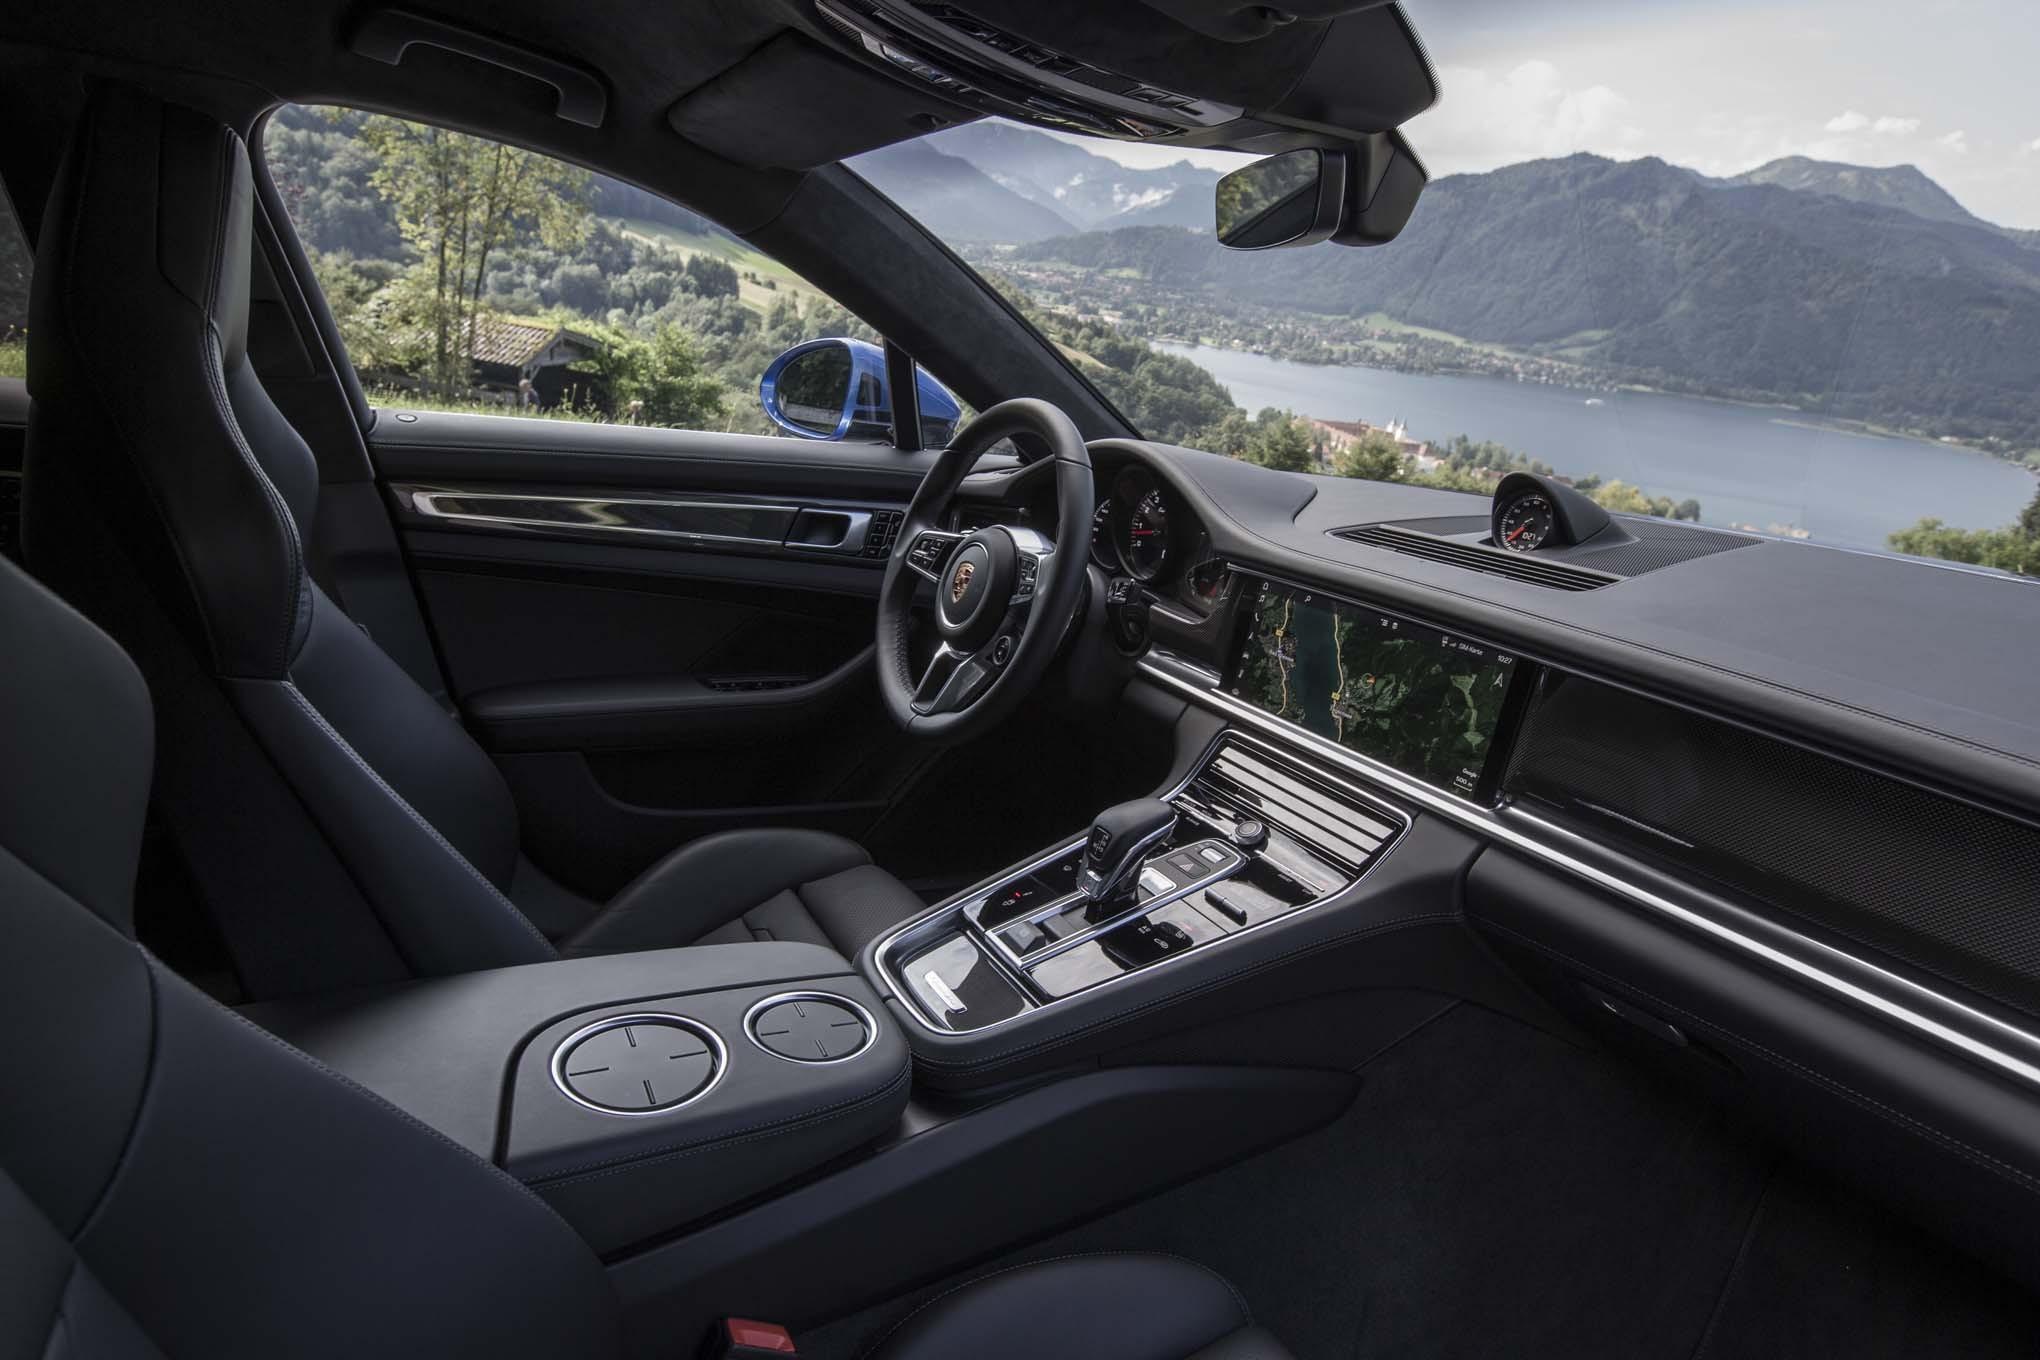 Porsche Panamera Desktop images